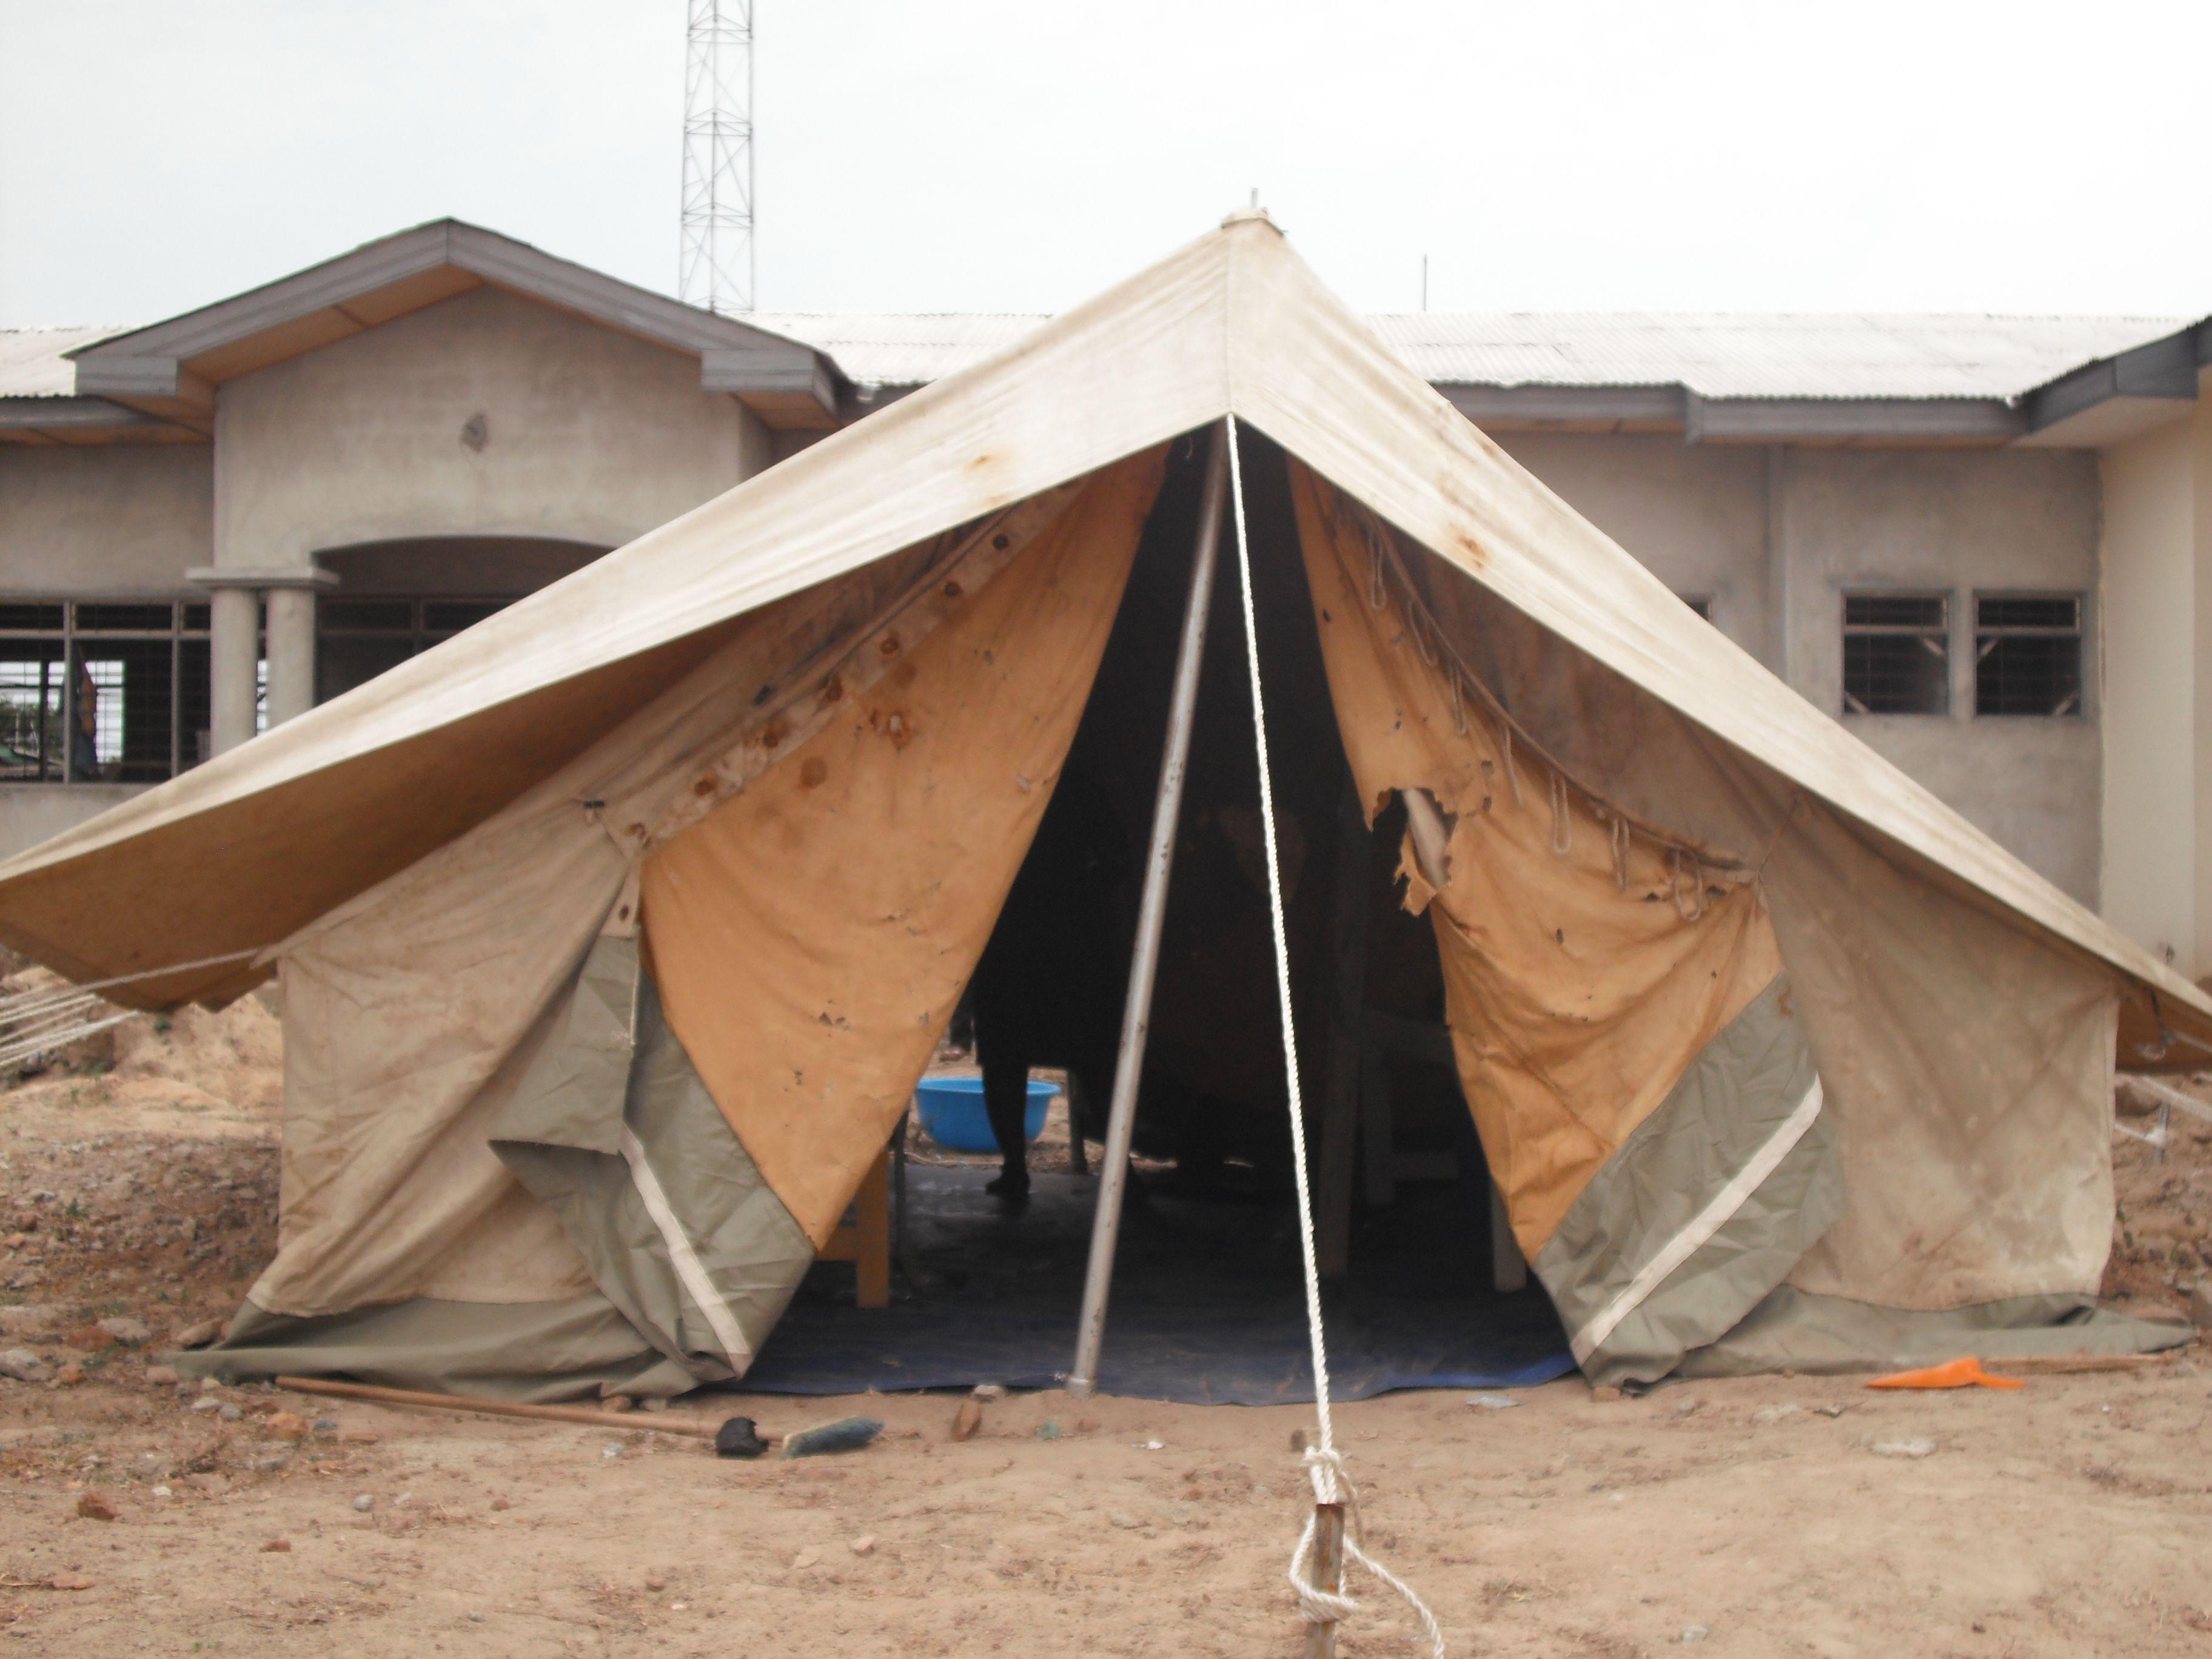 refugee tent & refugee tent | Refugee | Pinterest | Tents